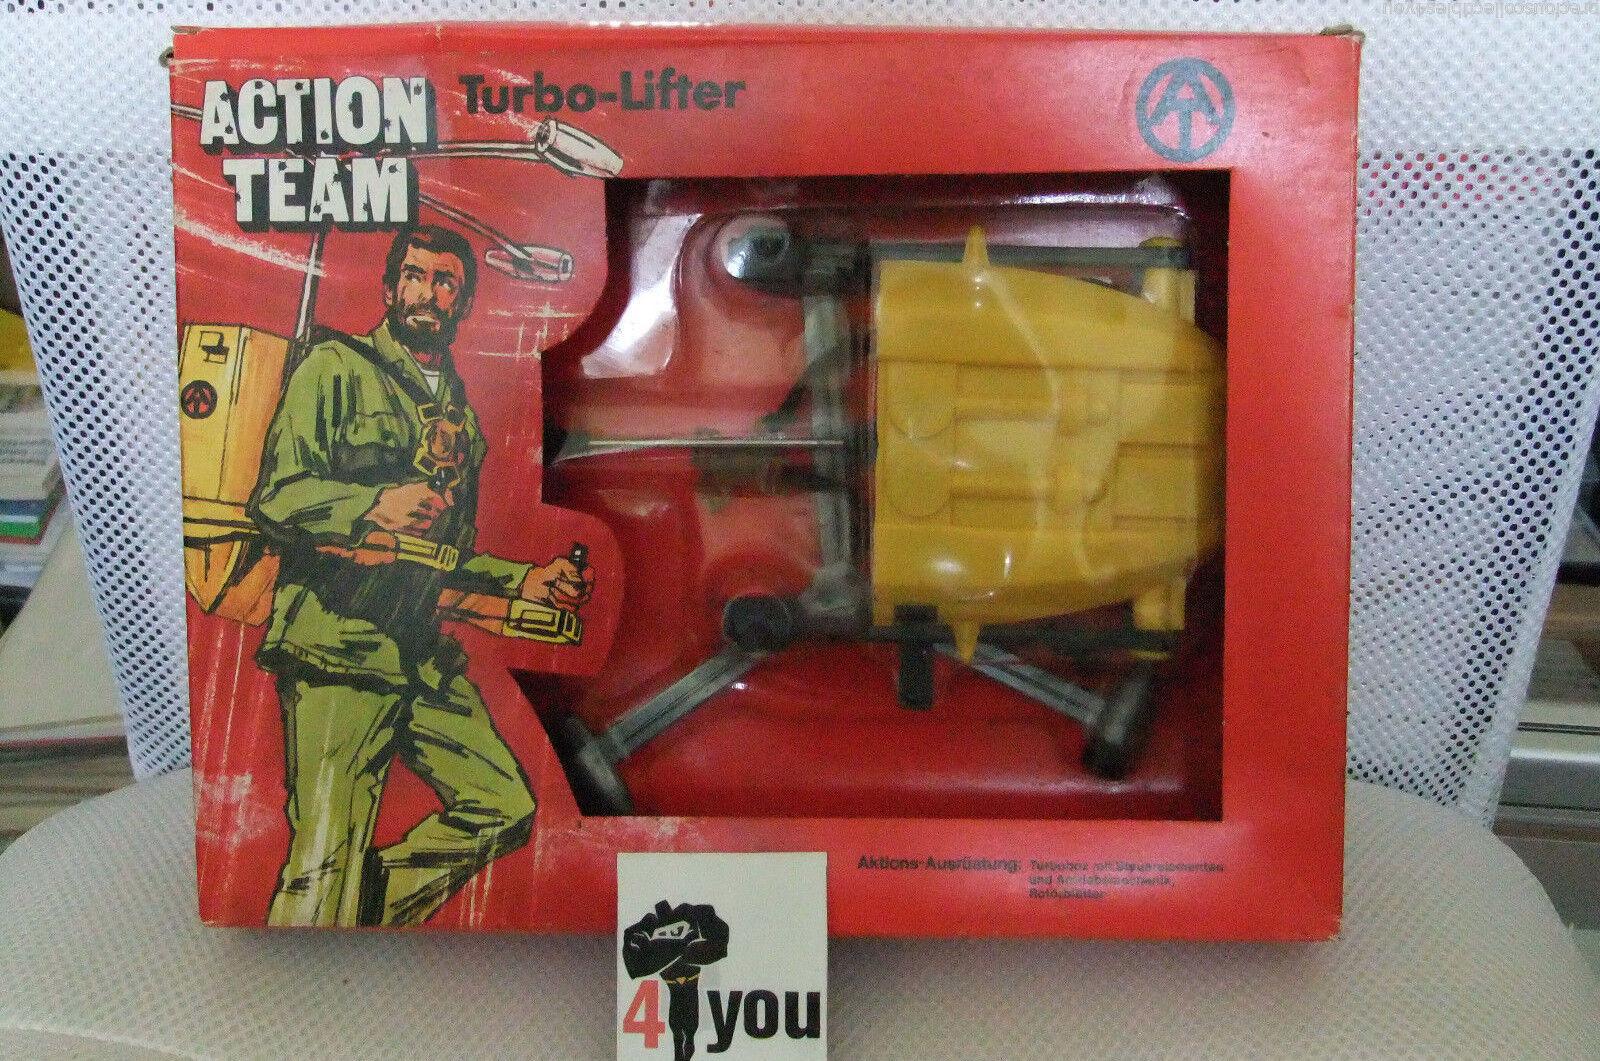 1970 moc vintage - gi joe action team mann turbo-lifter hasbro   02862